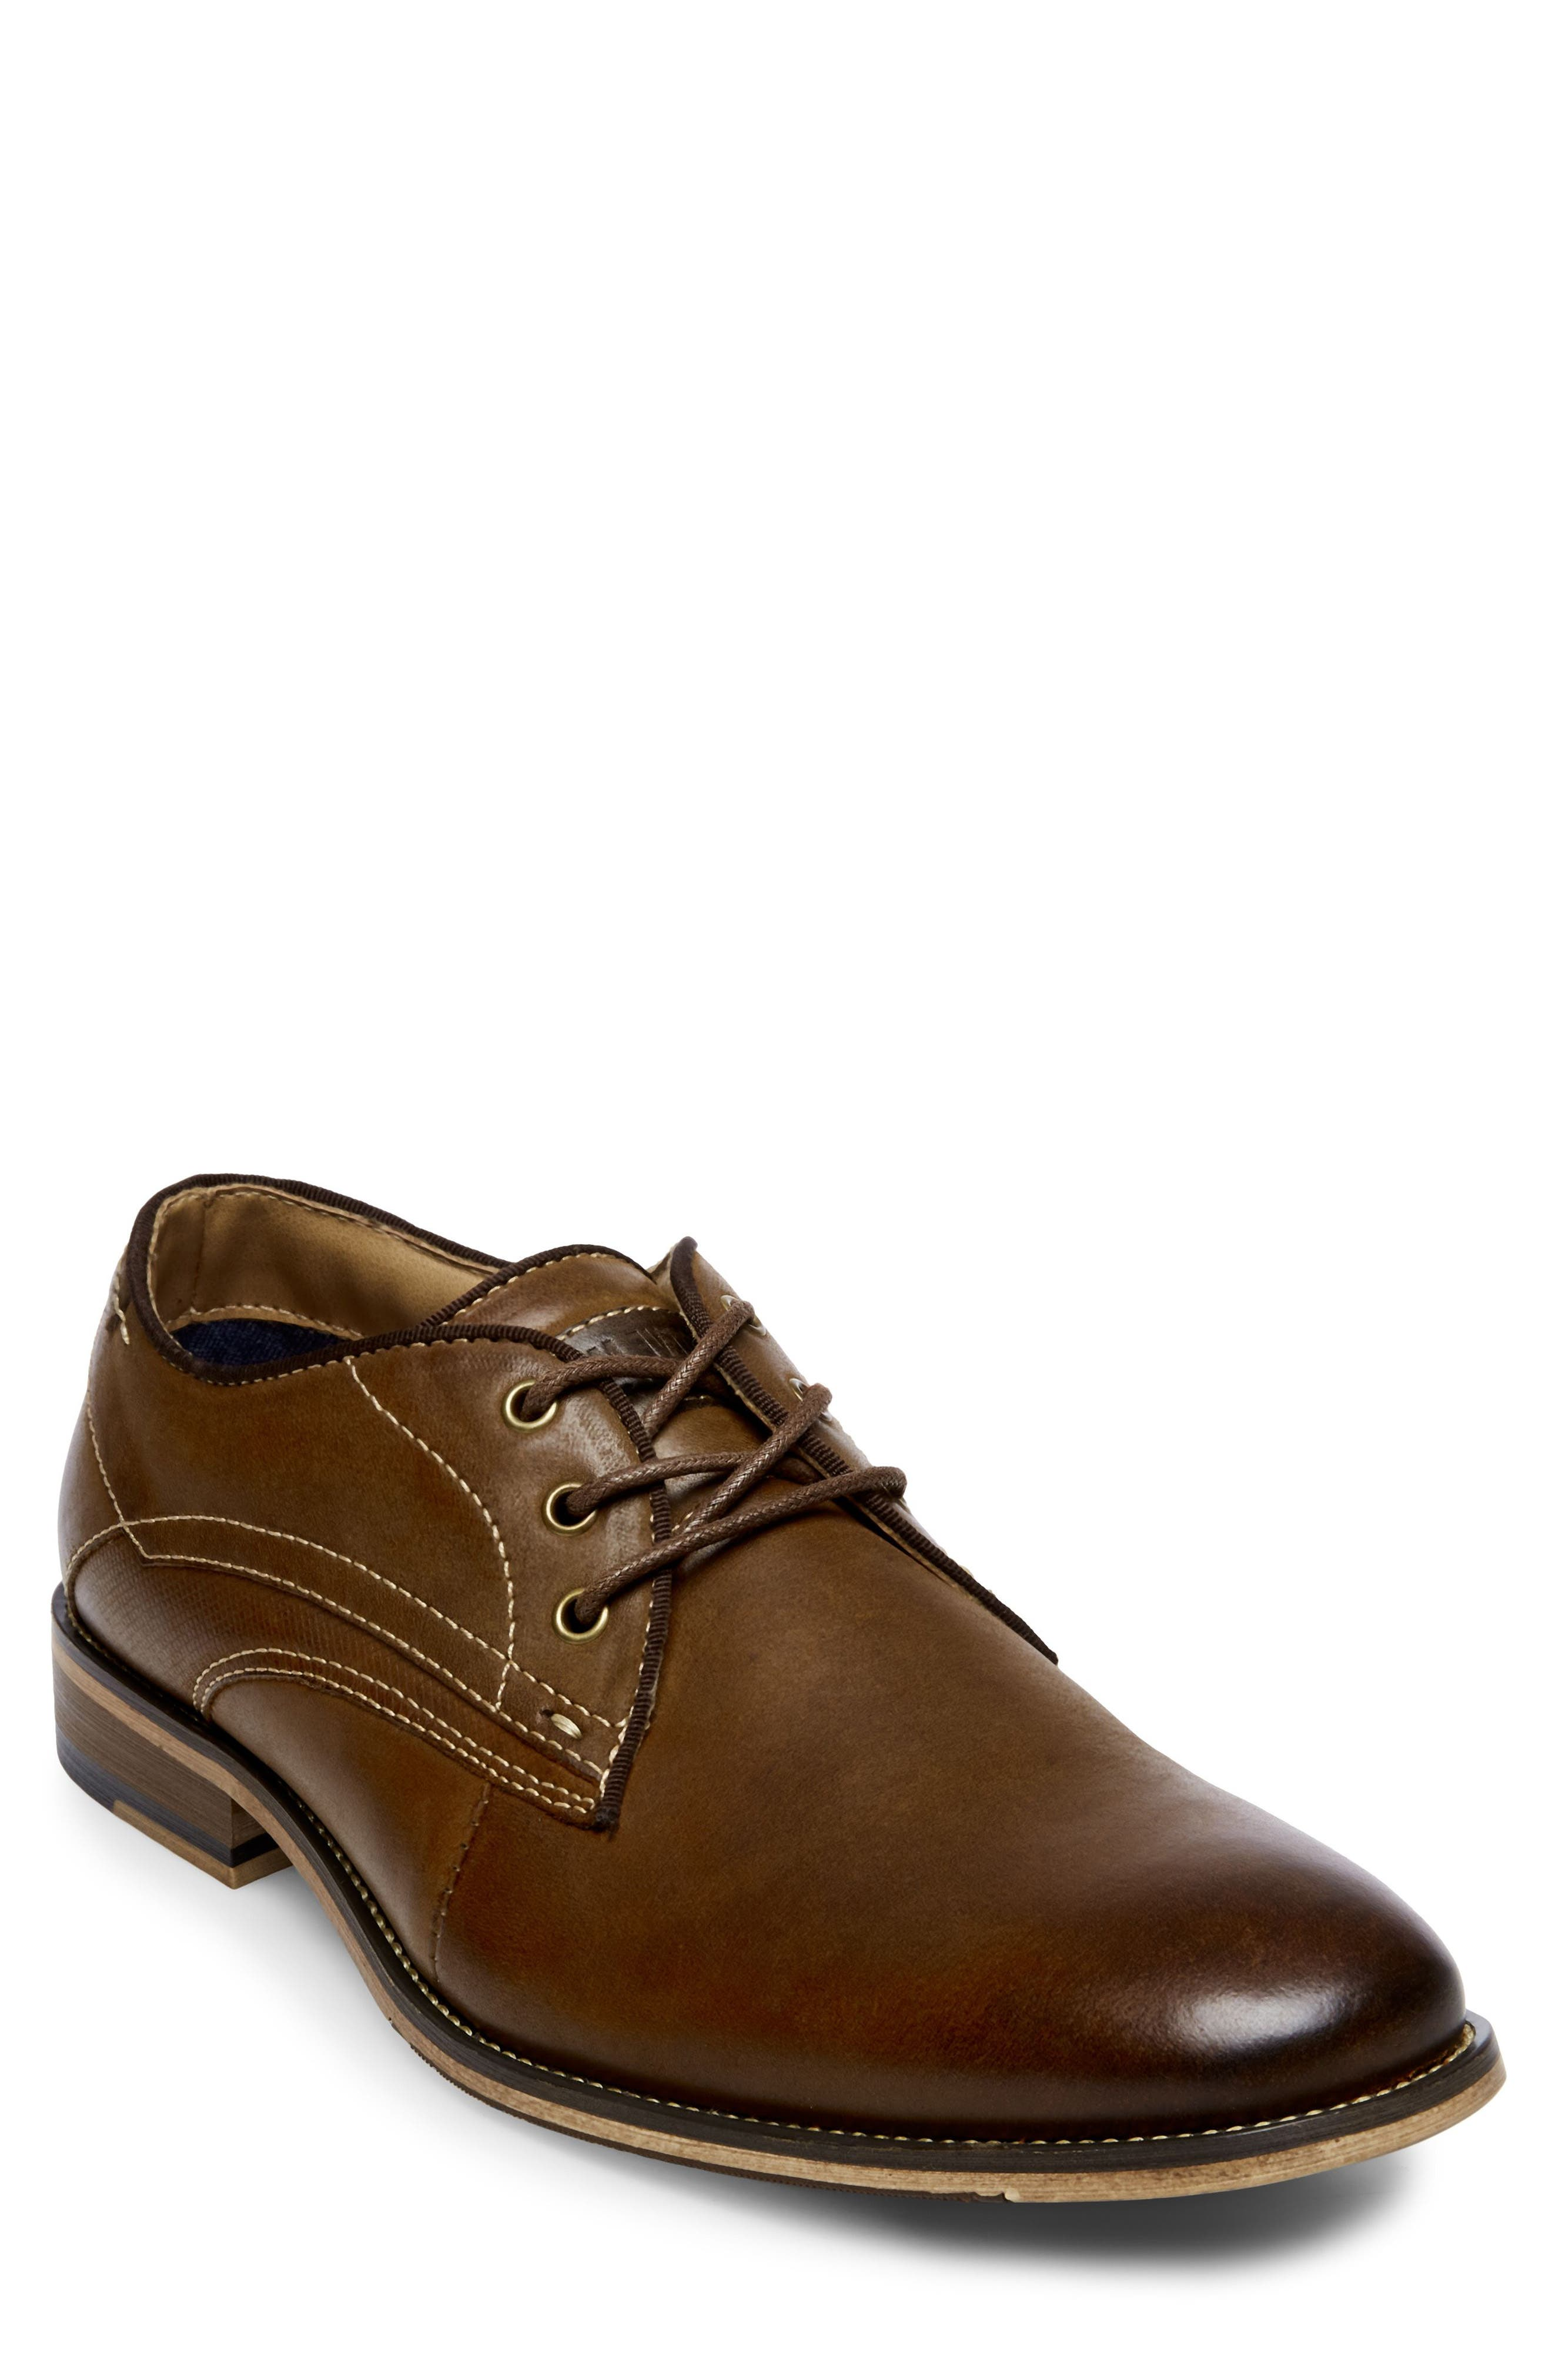 Jetset Plain Toe Derby,                         Main,                         color, Dark Tan Leather